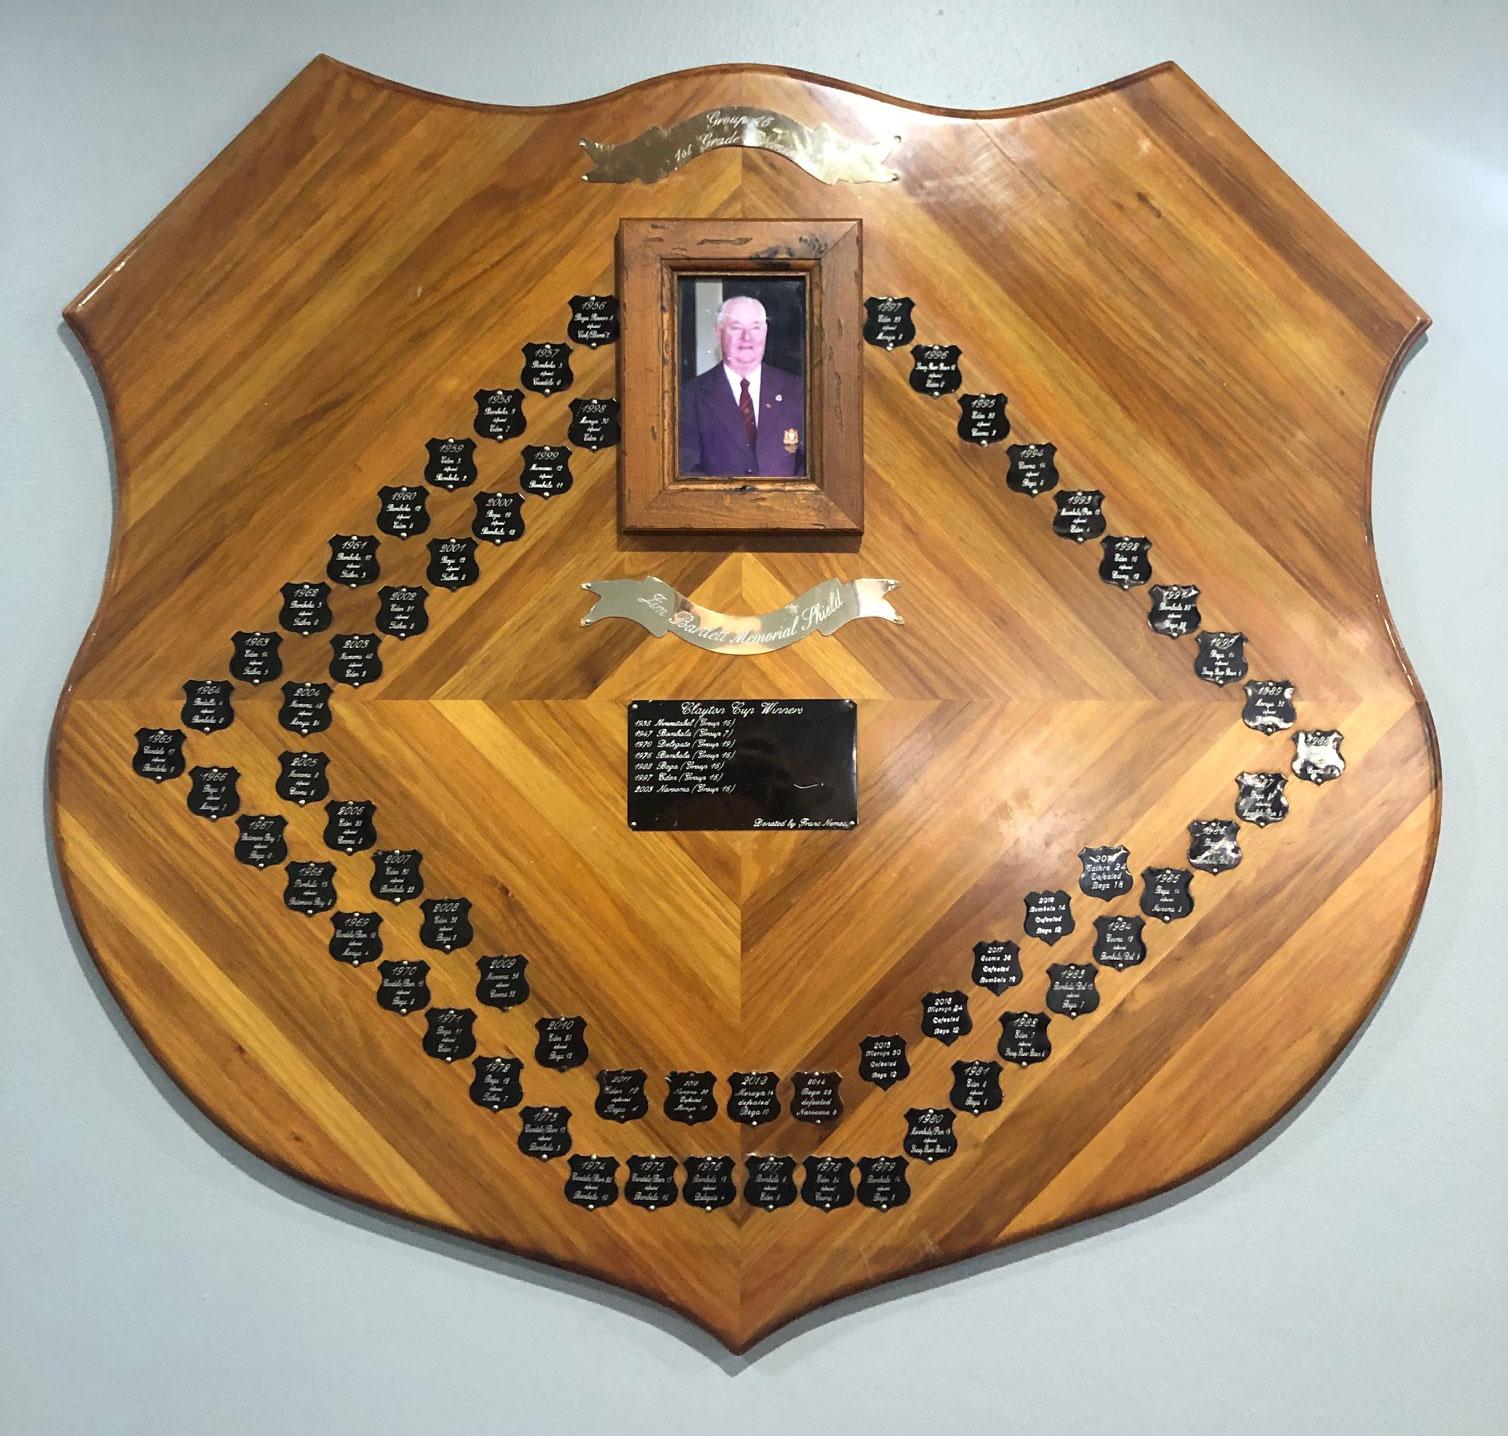 premiership shield